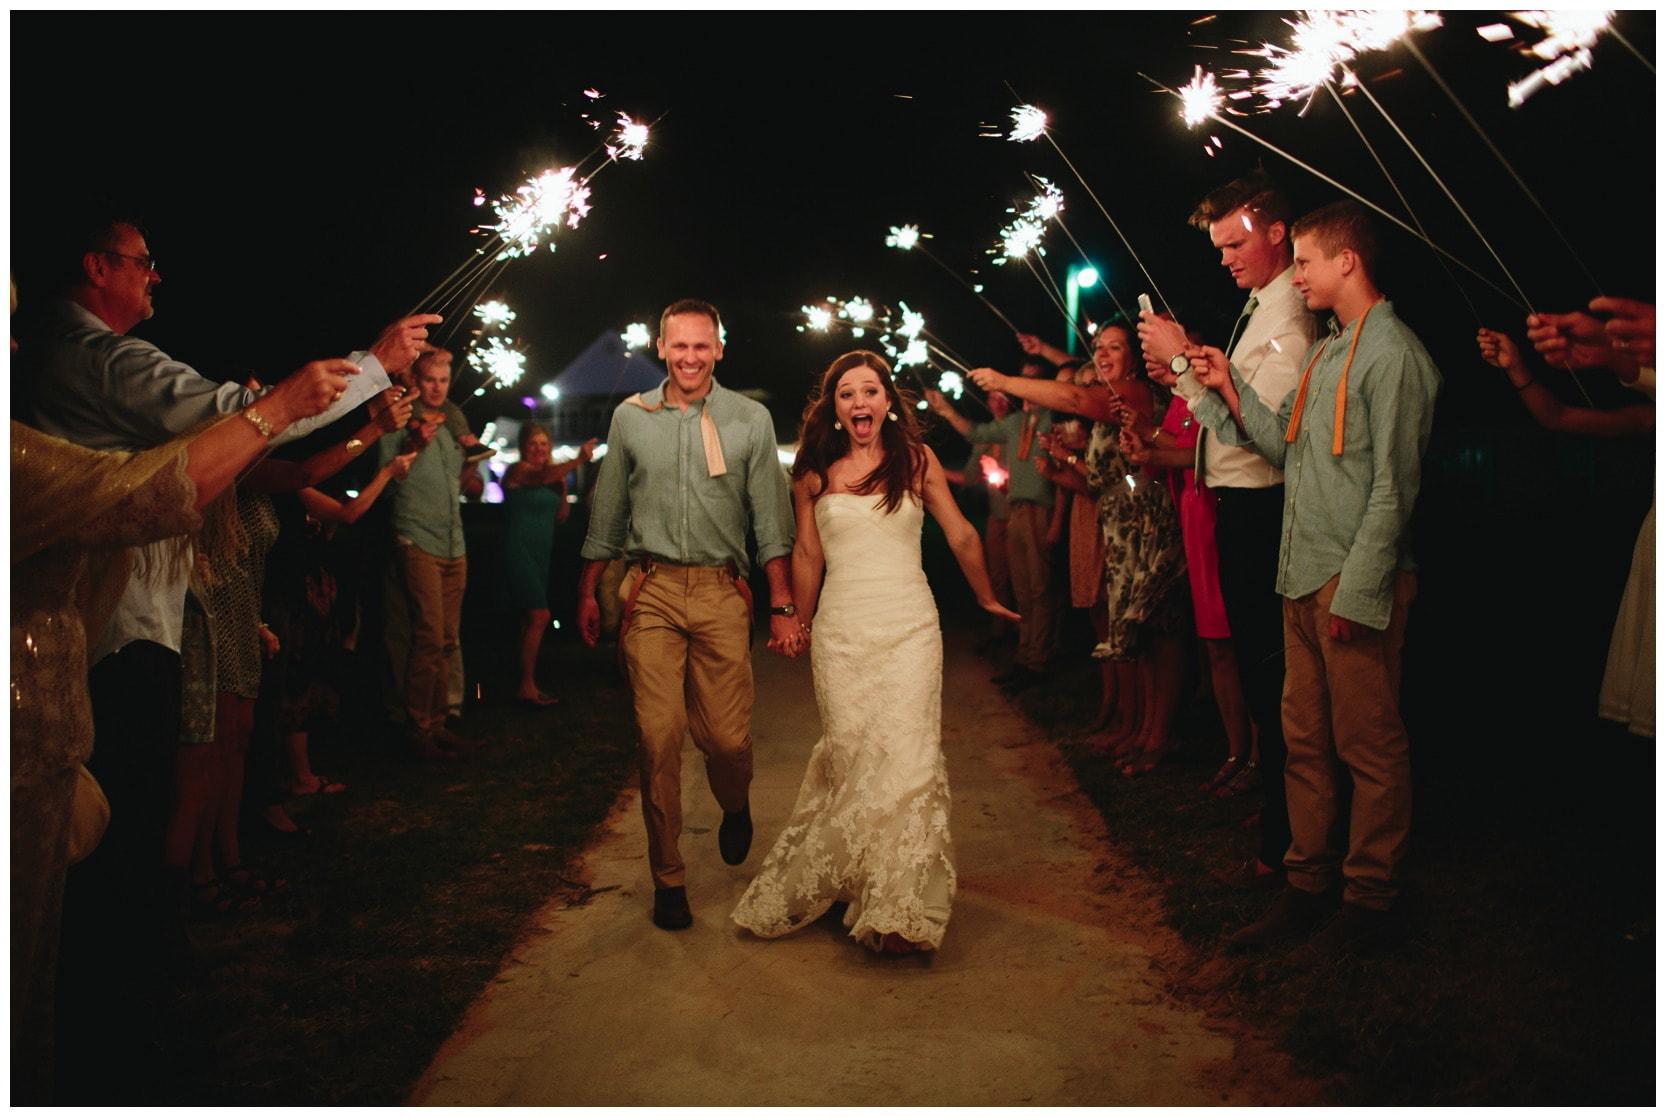 sauserkirby_wedding__324